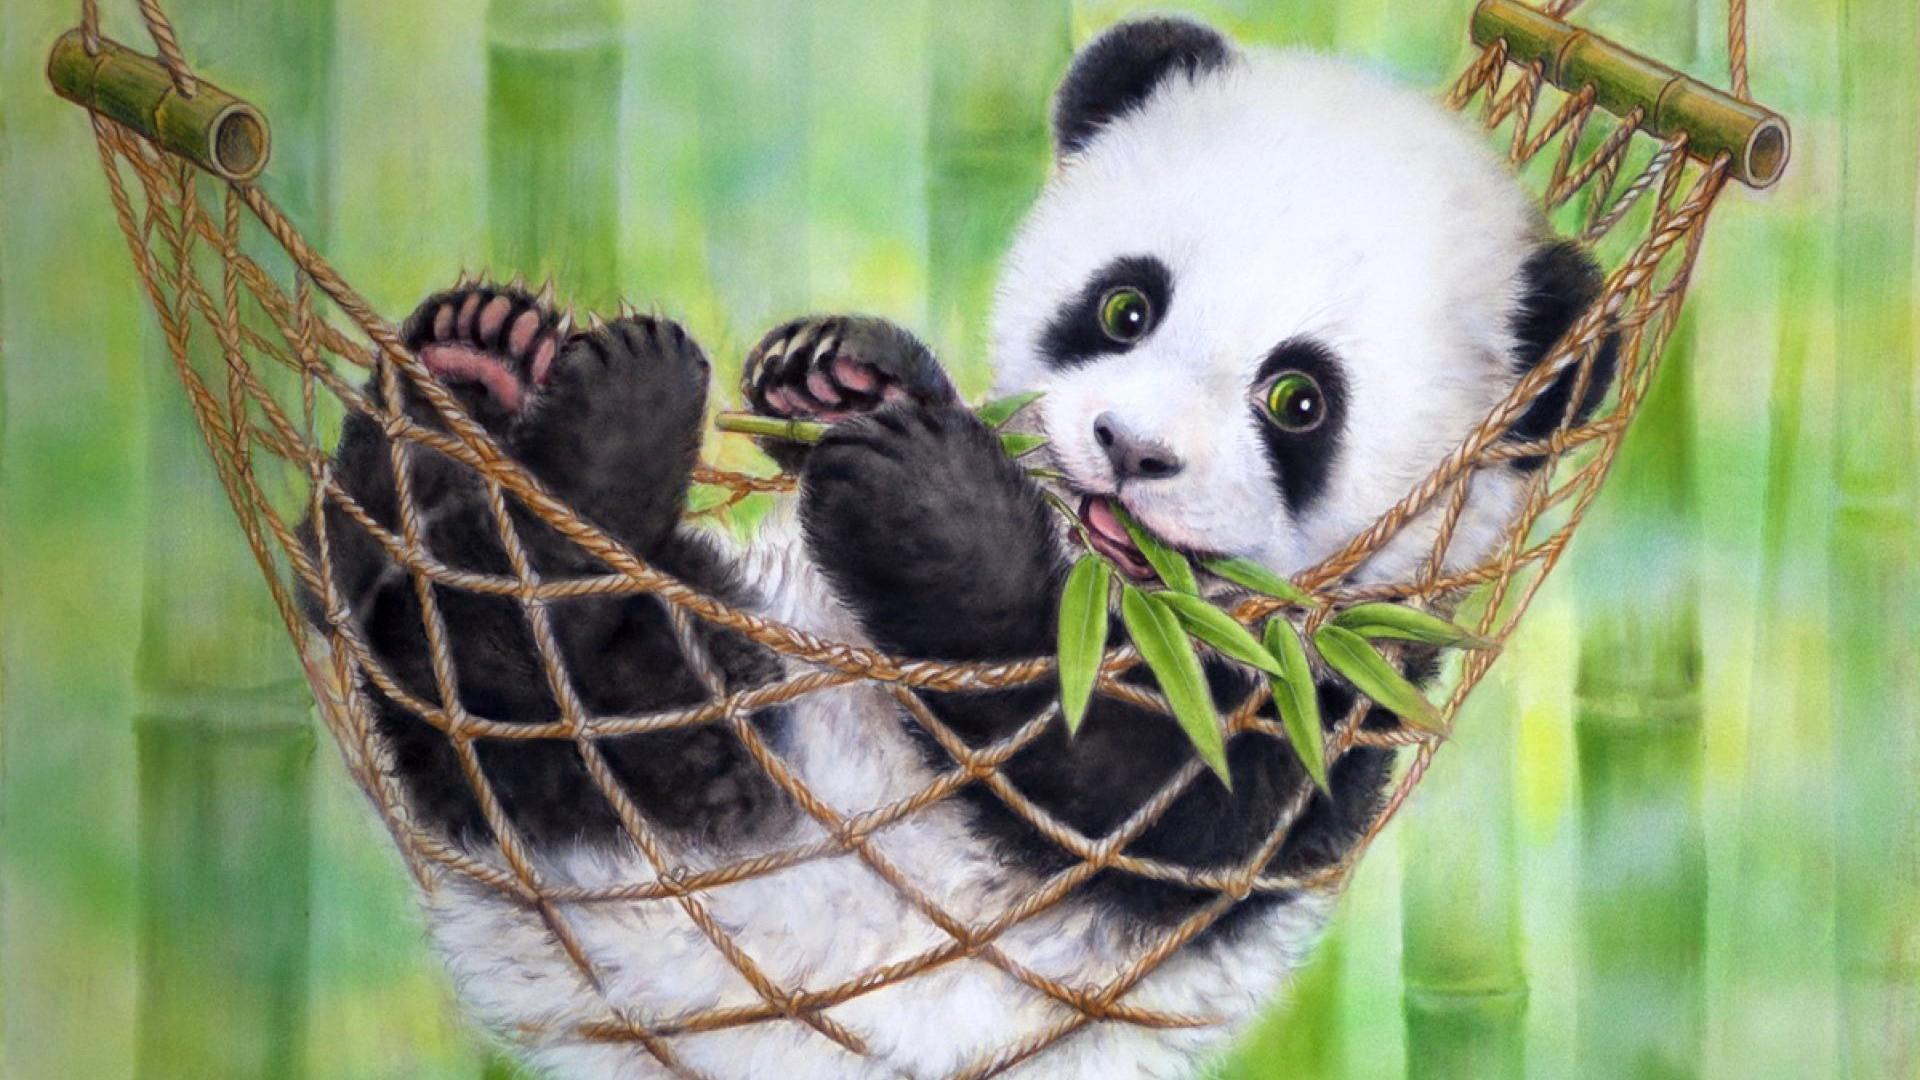 31 Cute Baby Animal 2017 Wallpaper On Wallpapersafari